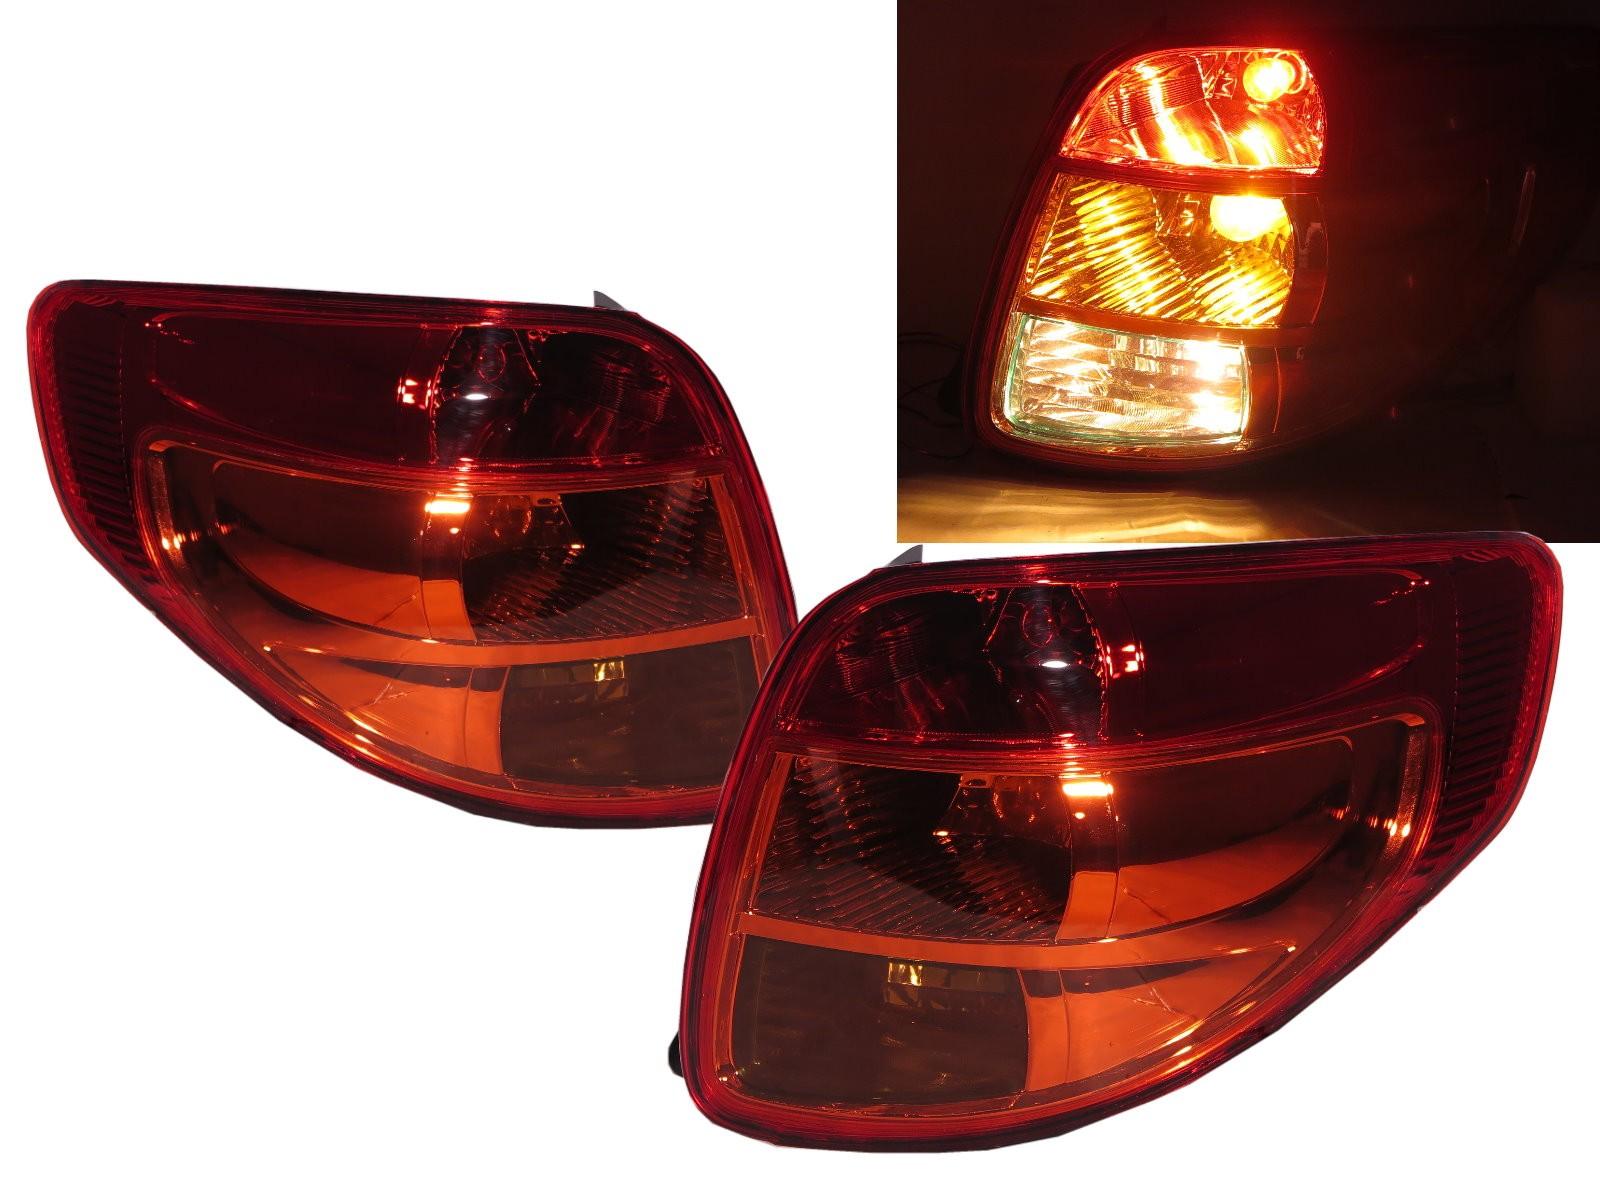 CrazyTheGod SX4 First generation 2007-2013 Hatchback 5D Clear Tail Rear Light Red for SUZUKI